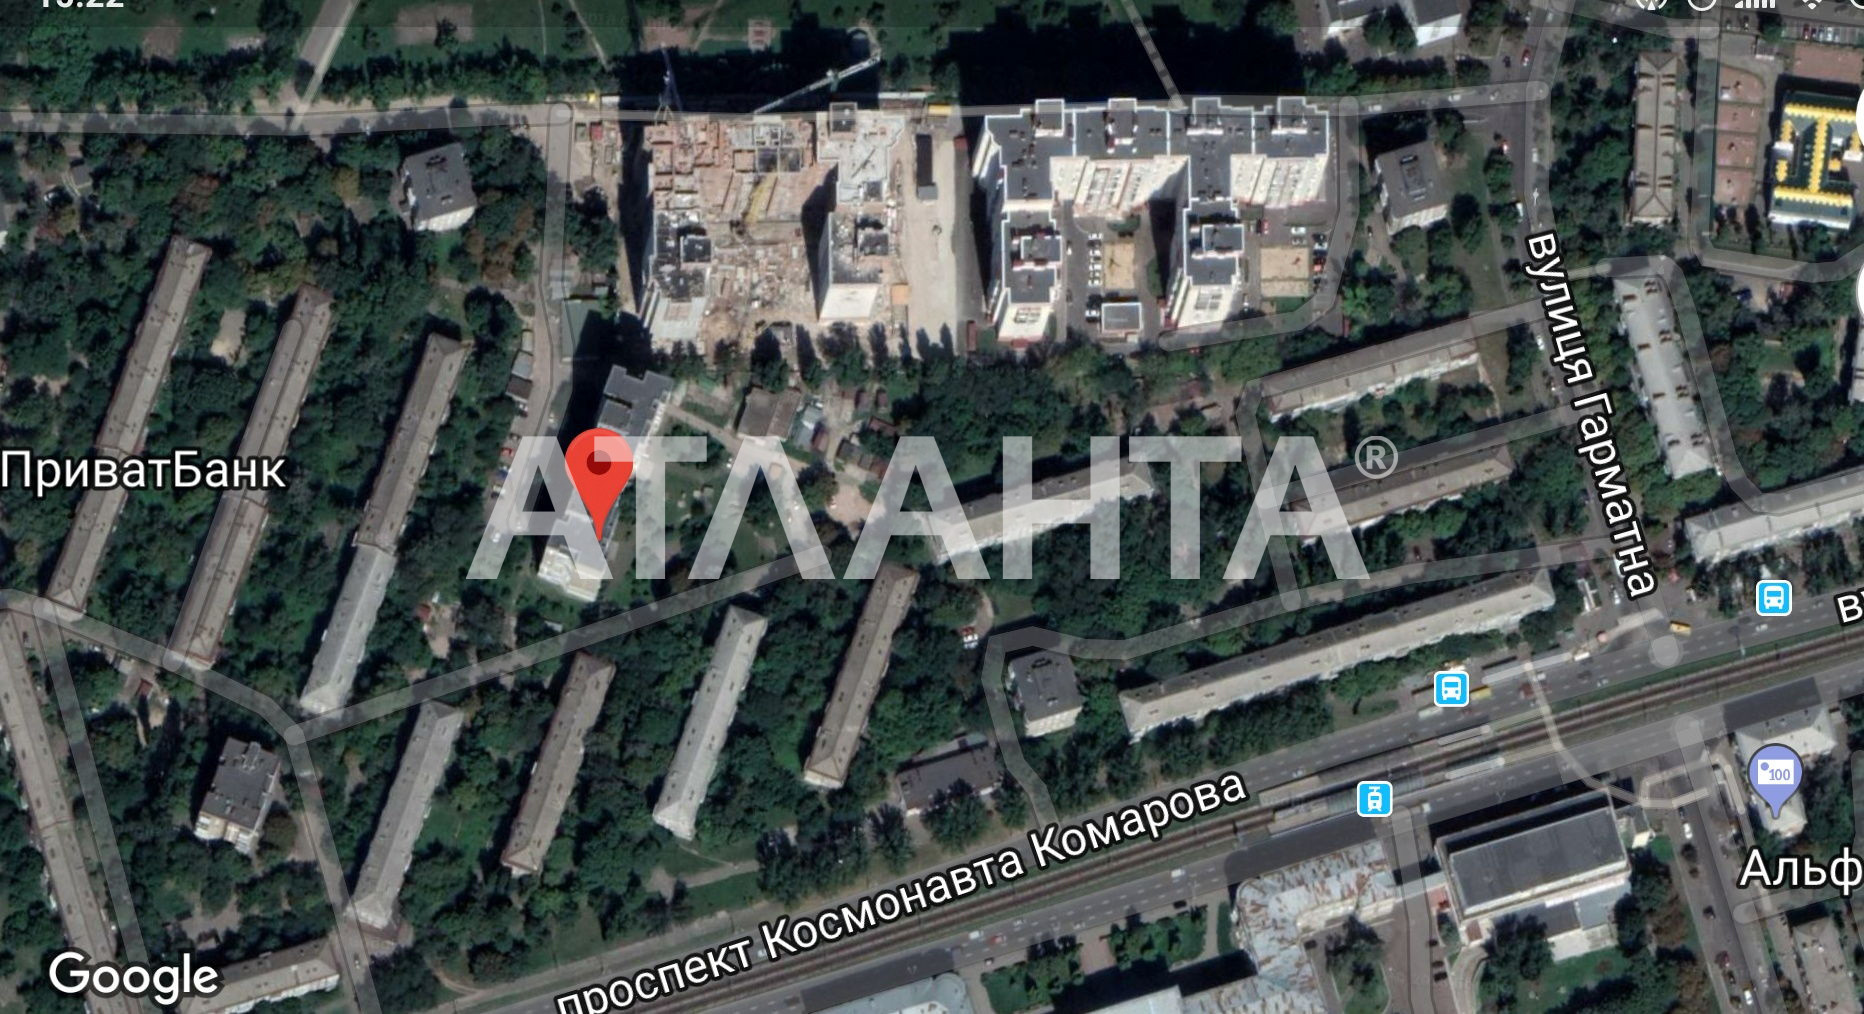 Продается 3-комнатная Квартира на ул. Проспект Космонавта Комарова — 60 000 у.е. (фото №23)